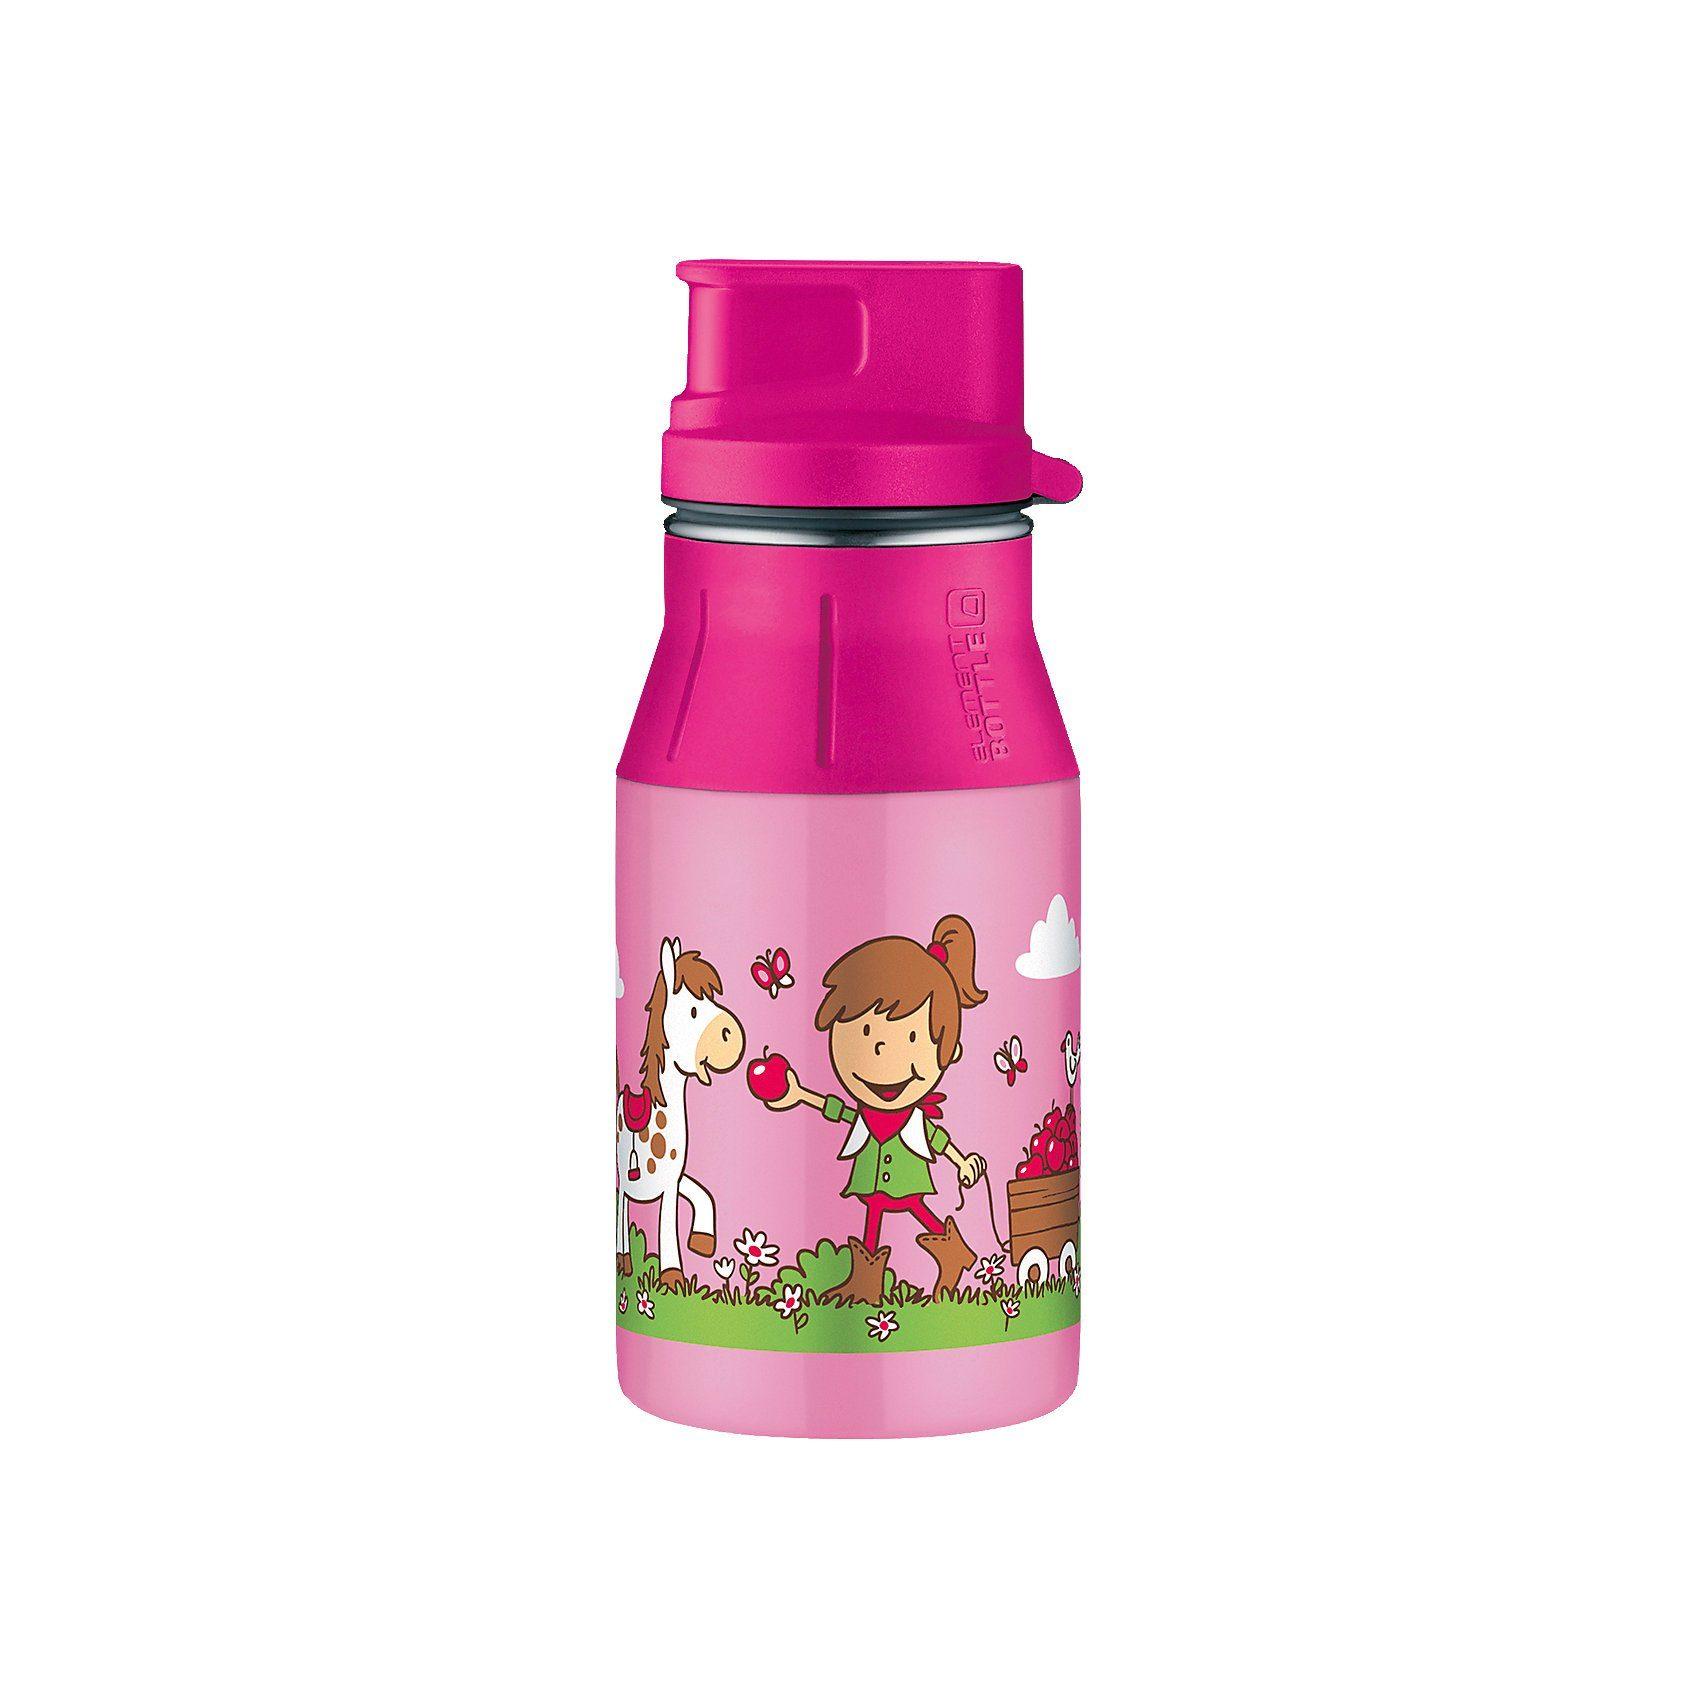 Alfi Trinkflasche elementBottle Farm, rosa, 400 ml